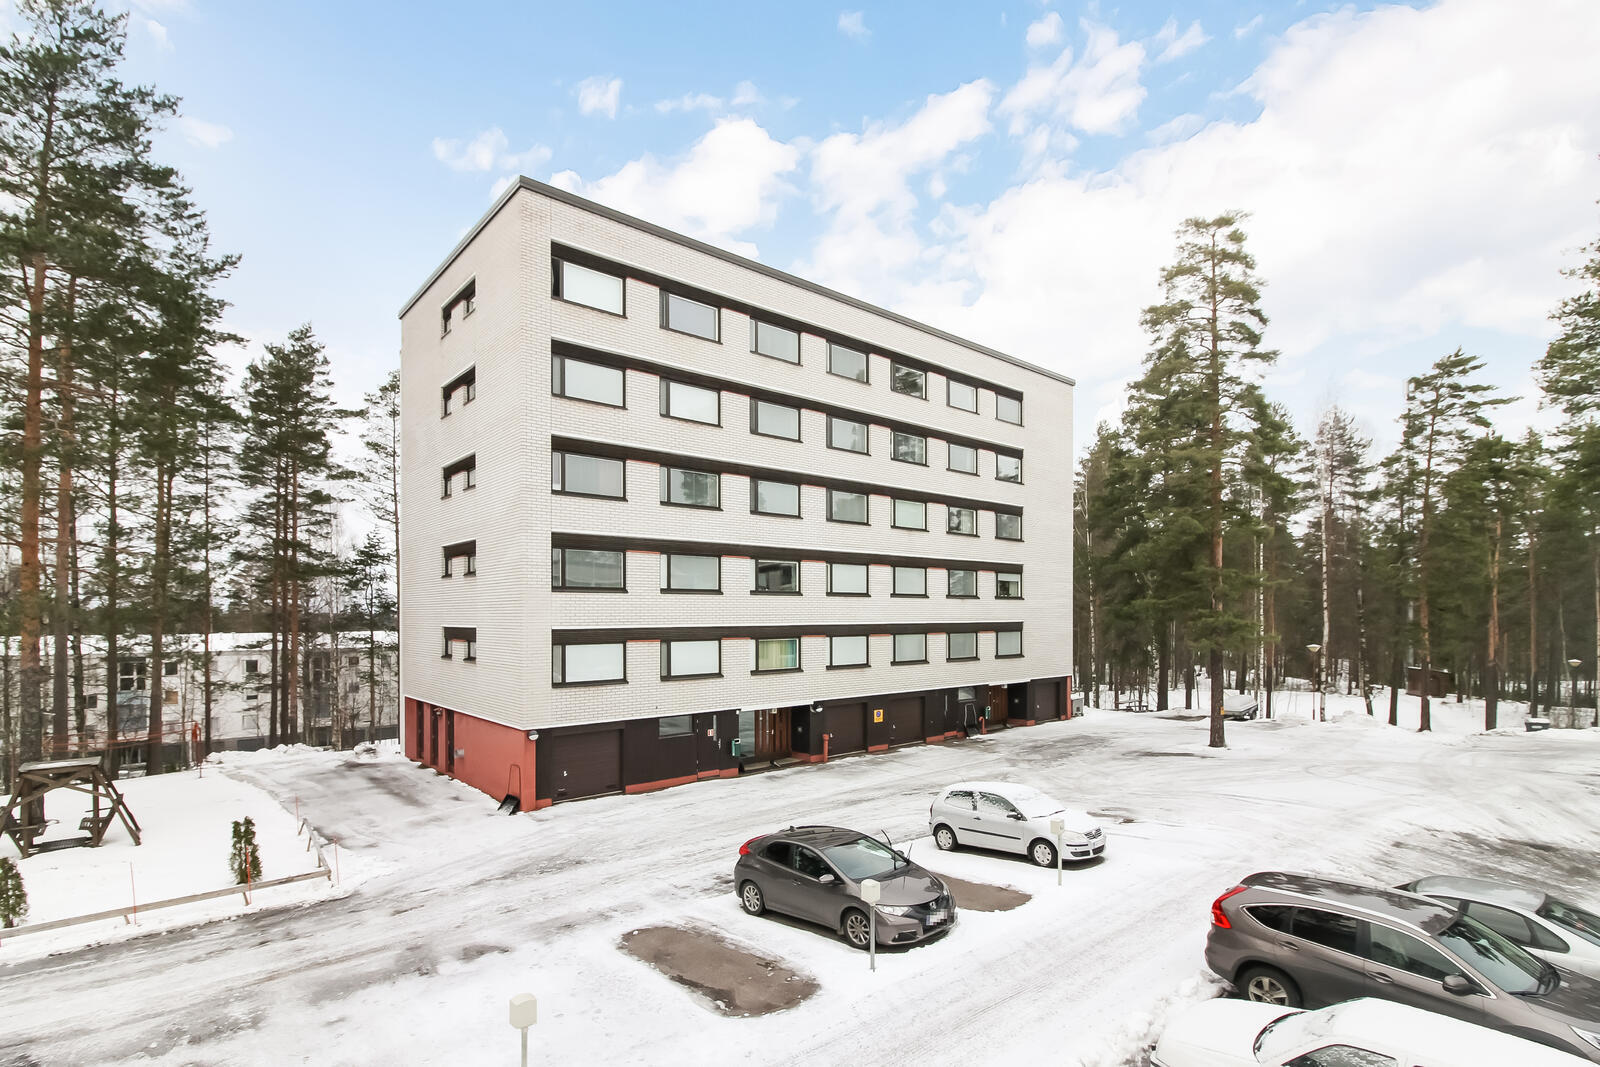 Huhtiniemi, Lappeenranta